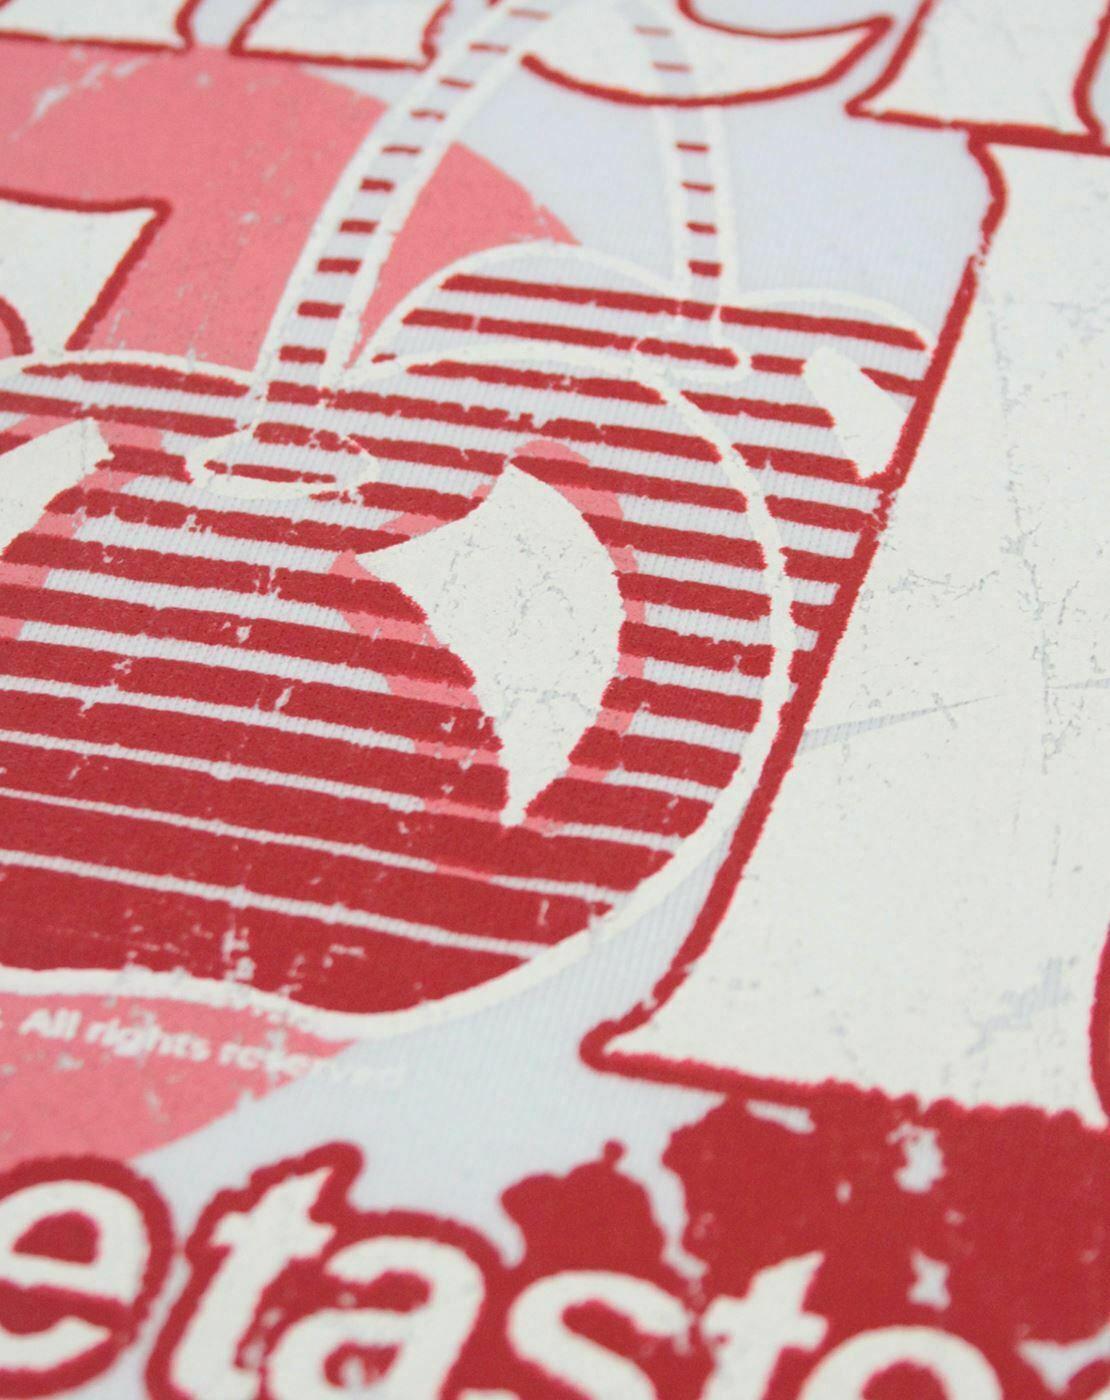 Cherry Coke Taste of The 80s Women/'s T-Shirt By Worn